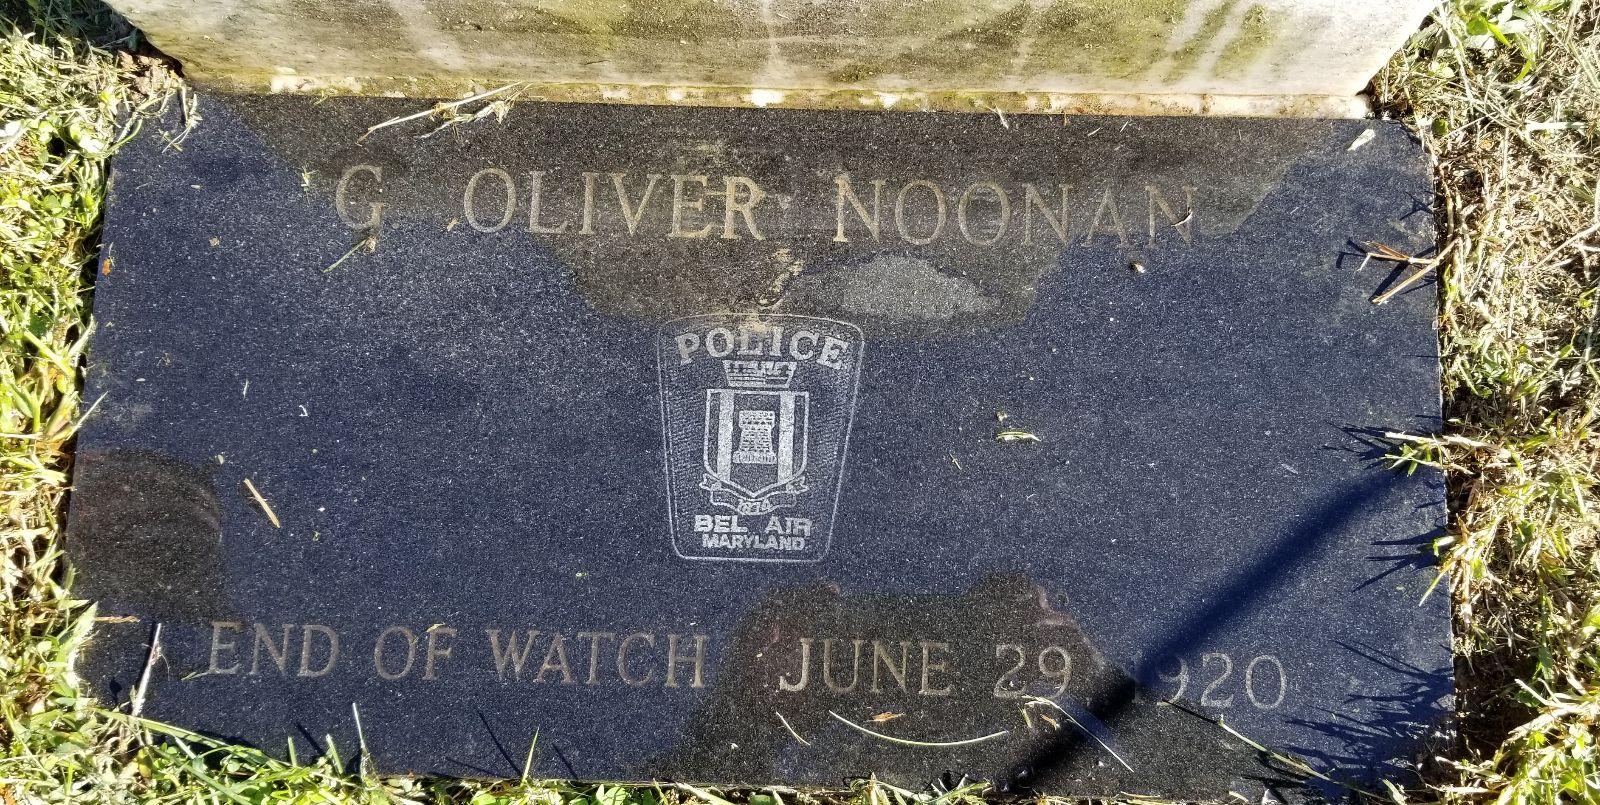 Officer George Oliver Noonan | Bel Air Police Department, Maryland